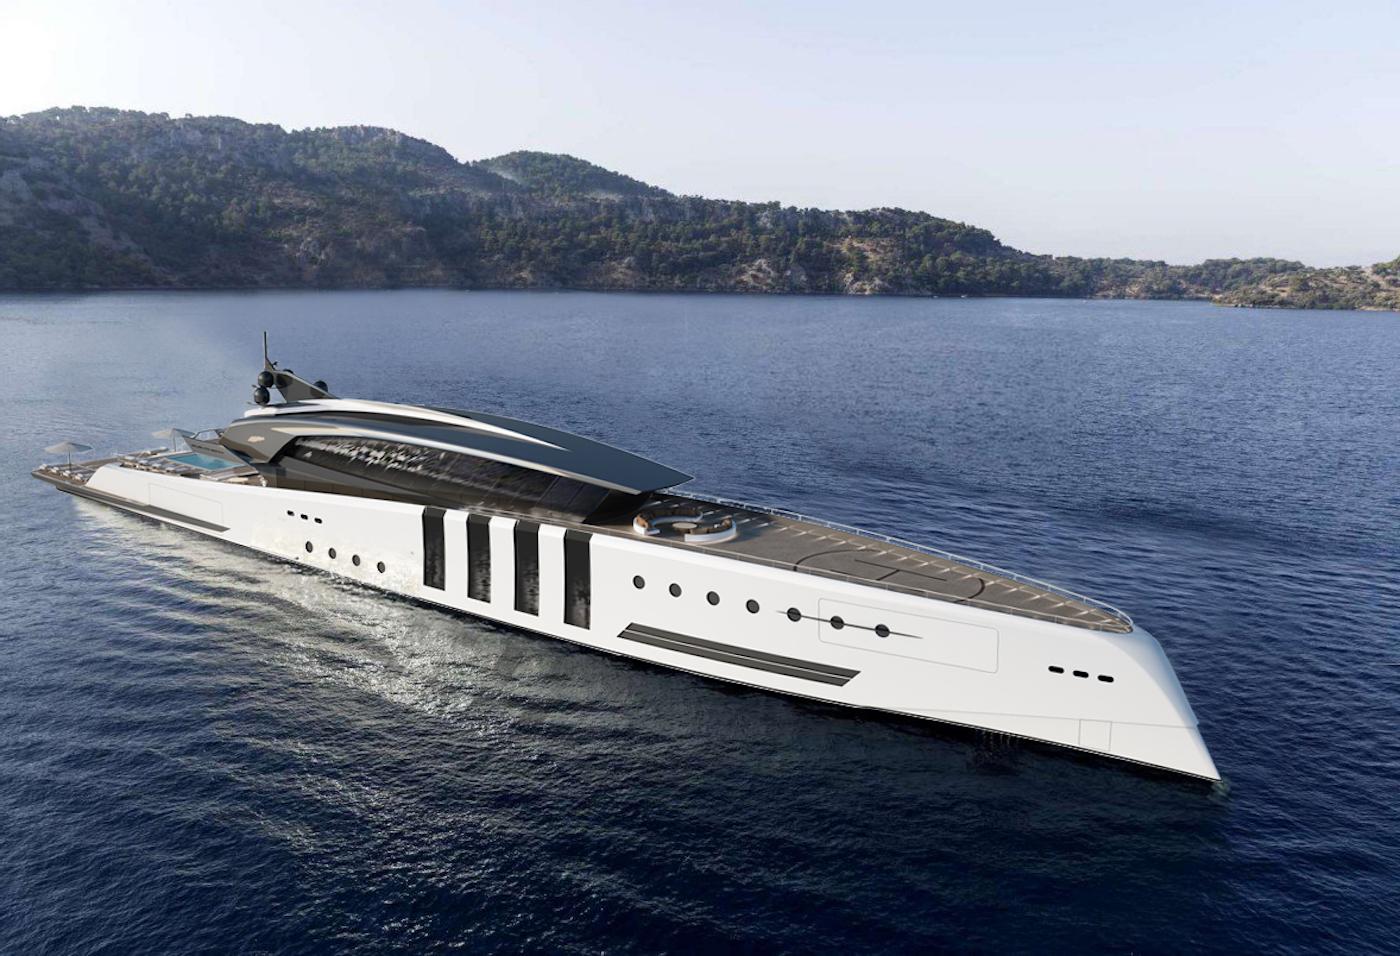 Eleuthera mega yacht © Azcarate Design